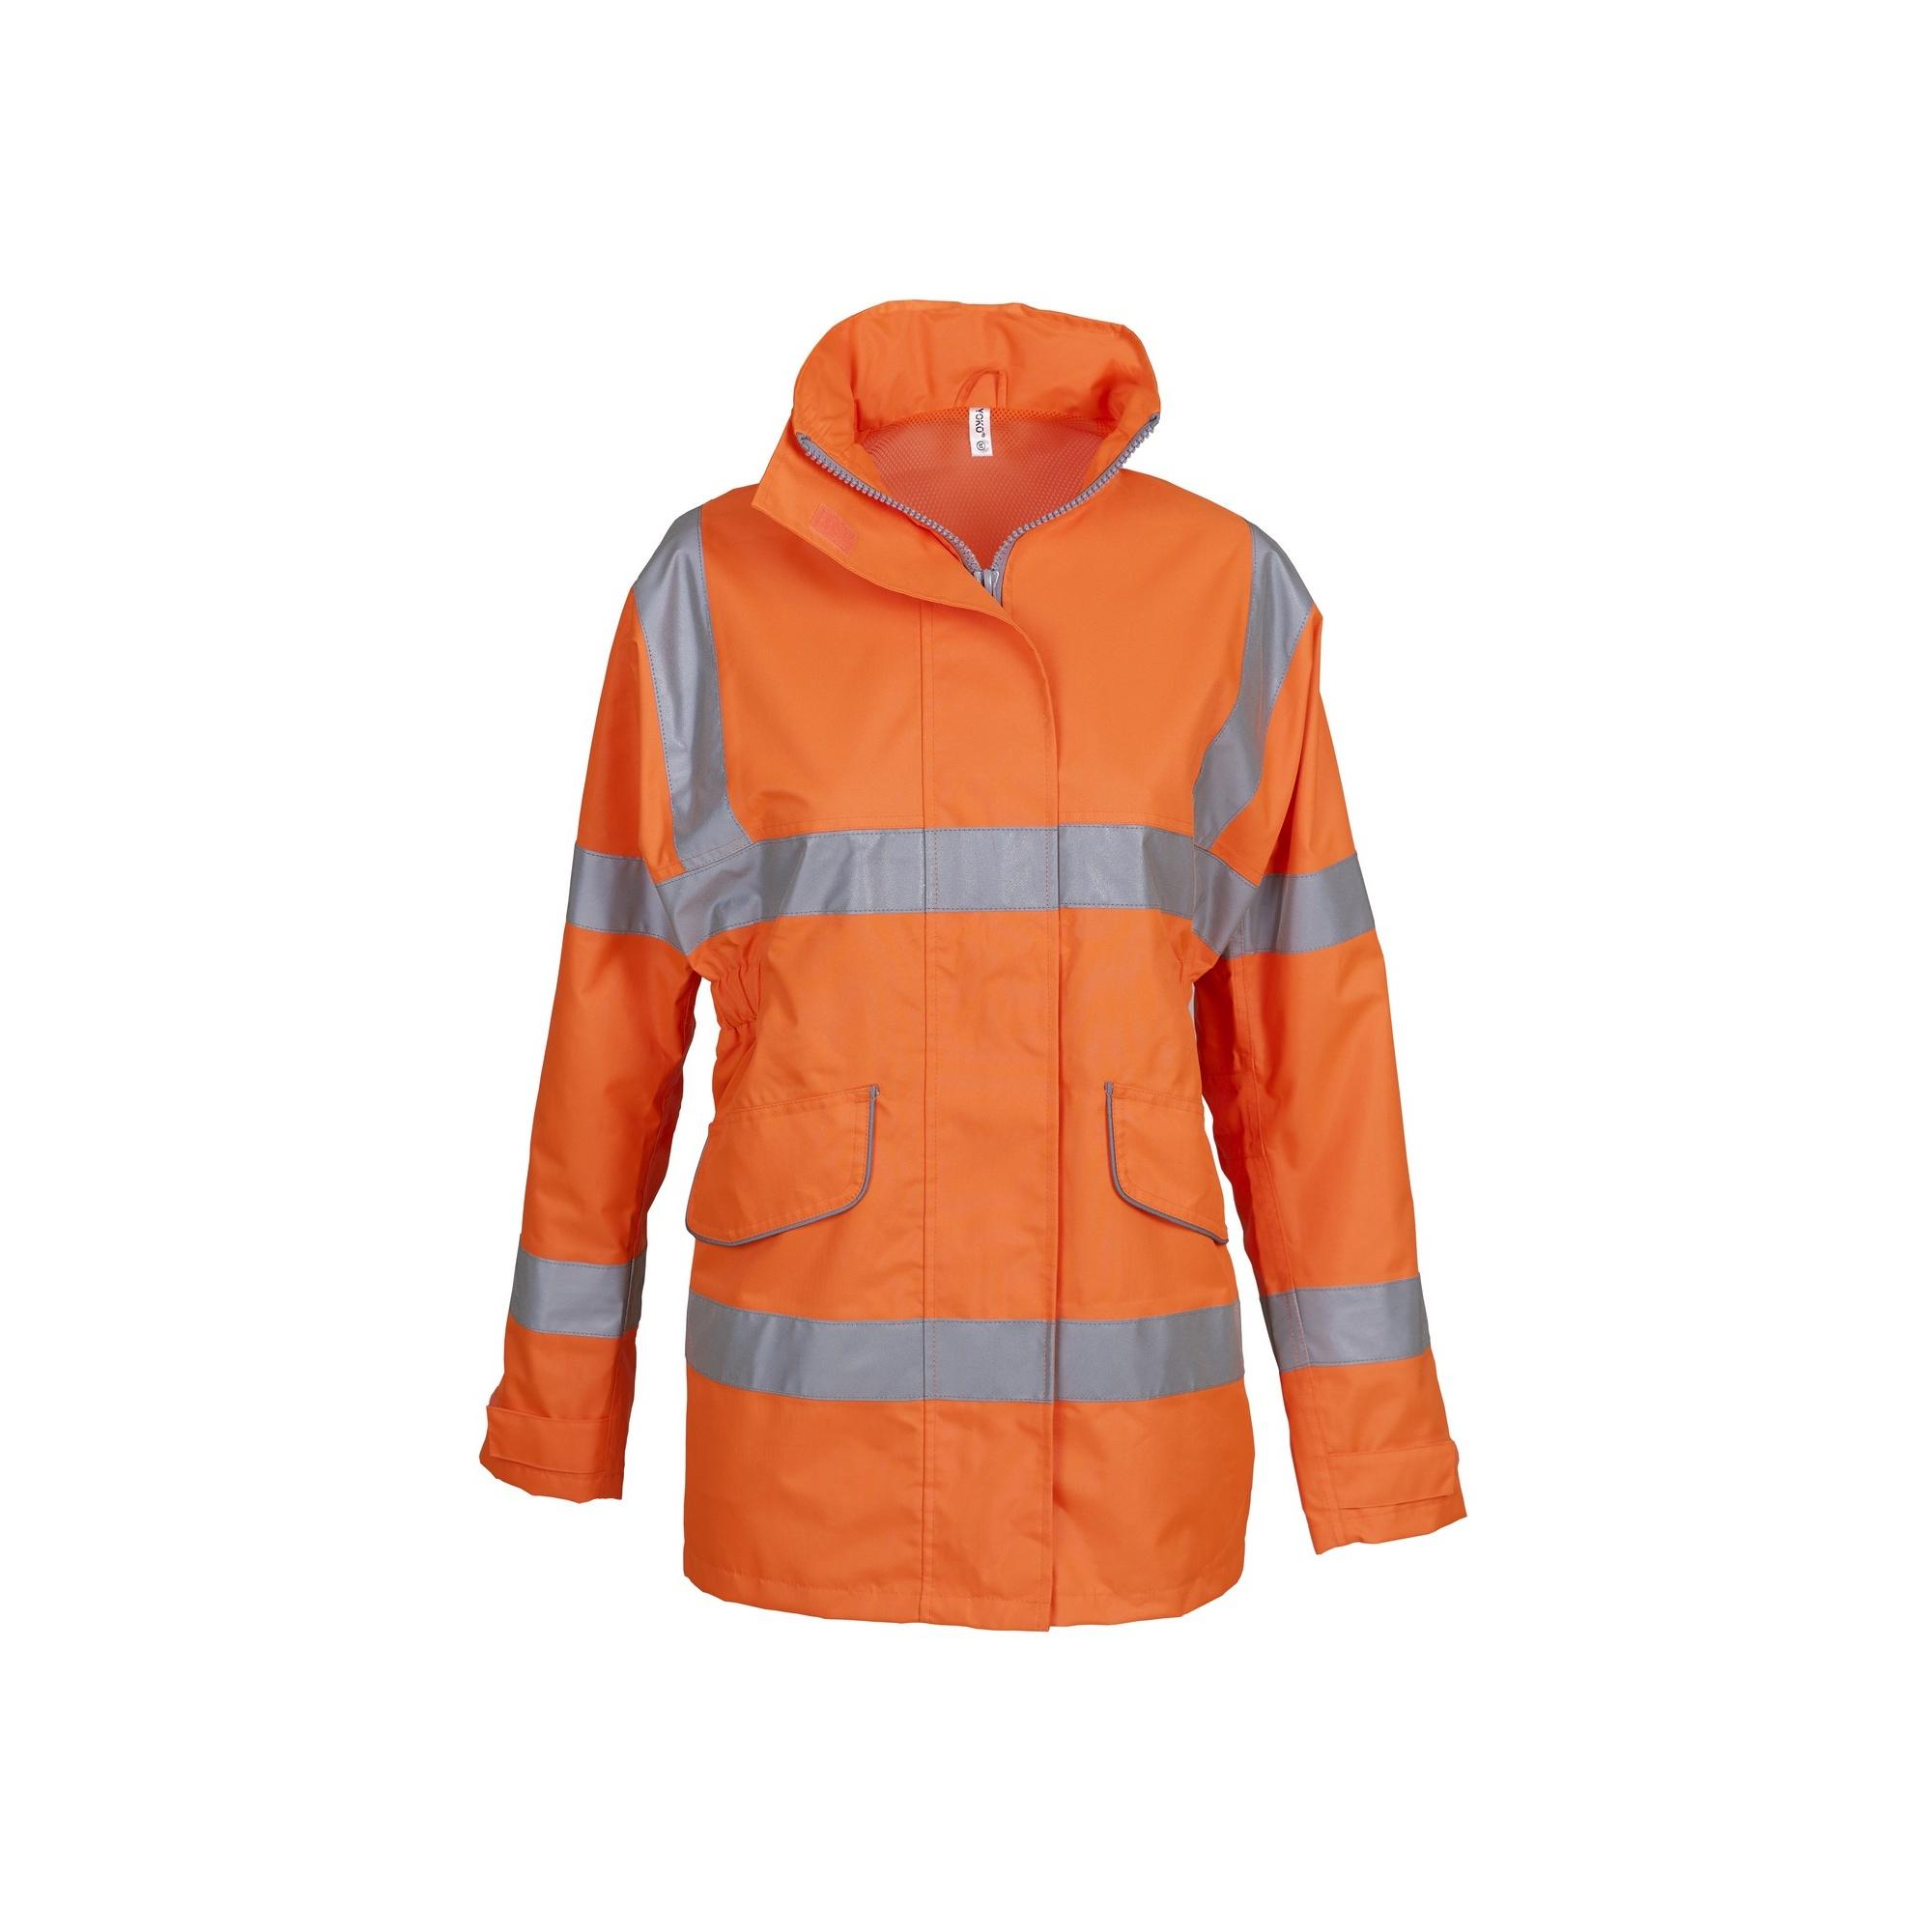 Yoko Womens/Ladies Hi-Vis Executive Jacket (XL) (Orange)